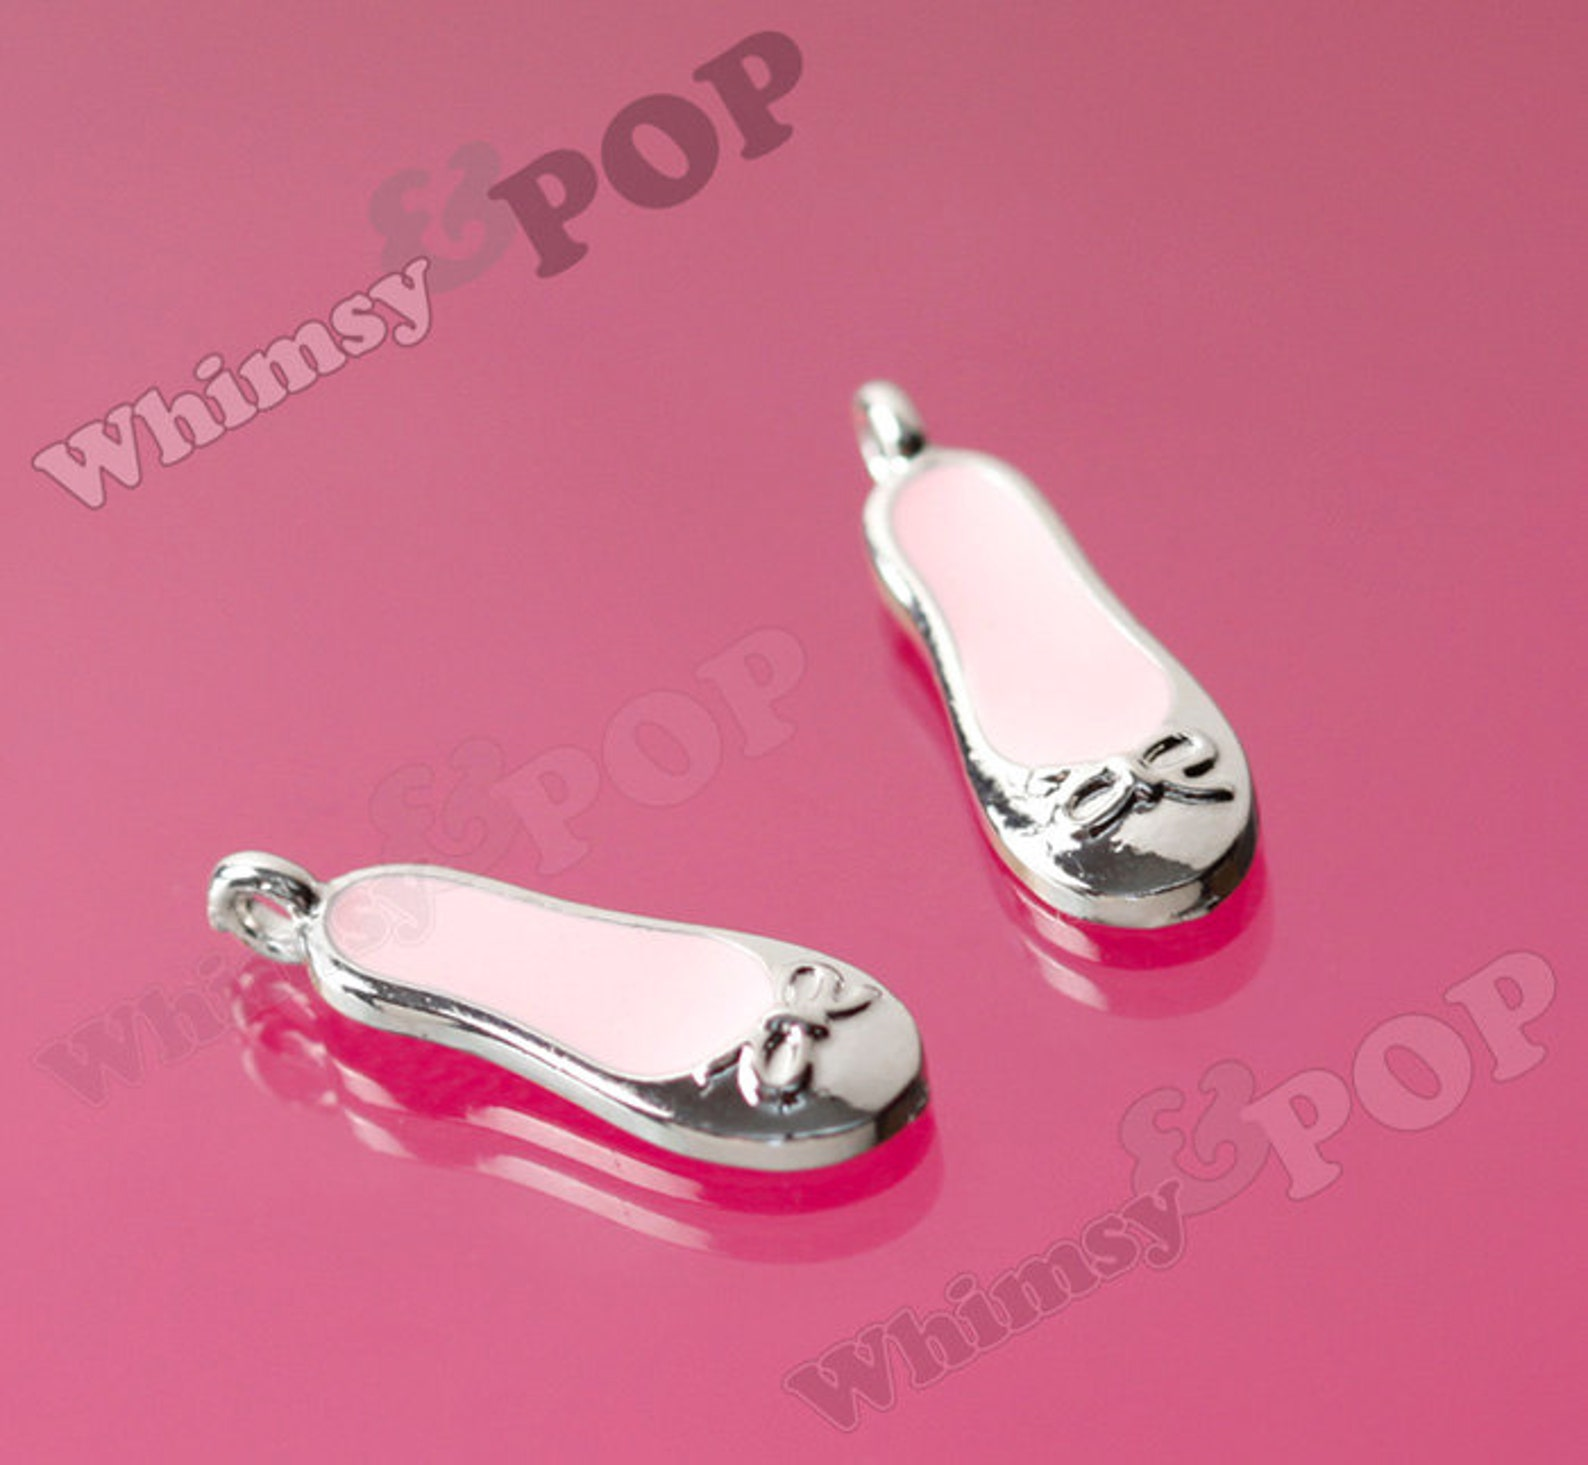 dollar sale ballet shoe charm, silver pink enamel ballerina ballet slipper charm, ballet charm, ballet slipper charm, 22mm x 7.5